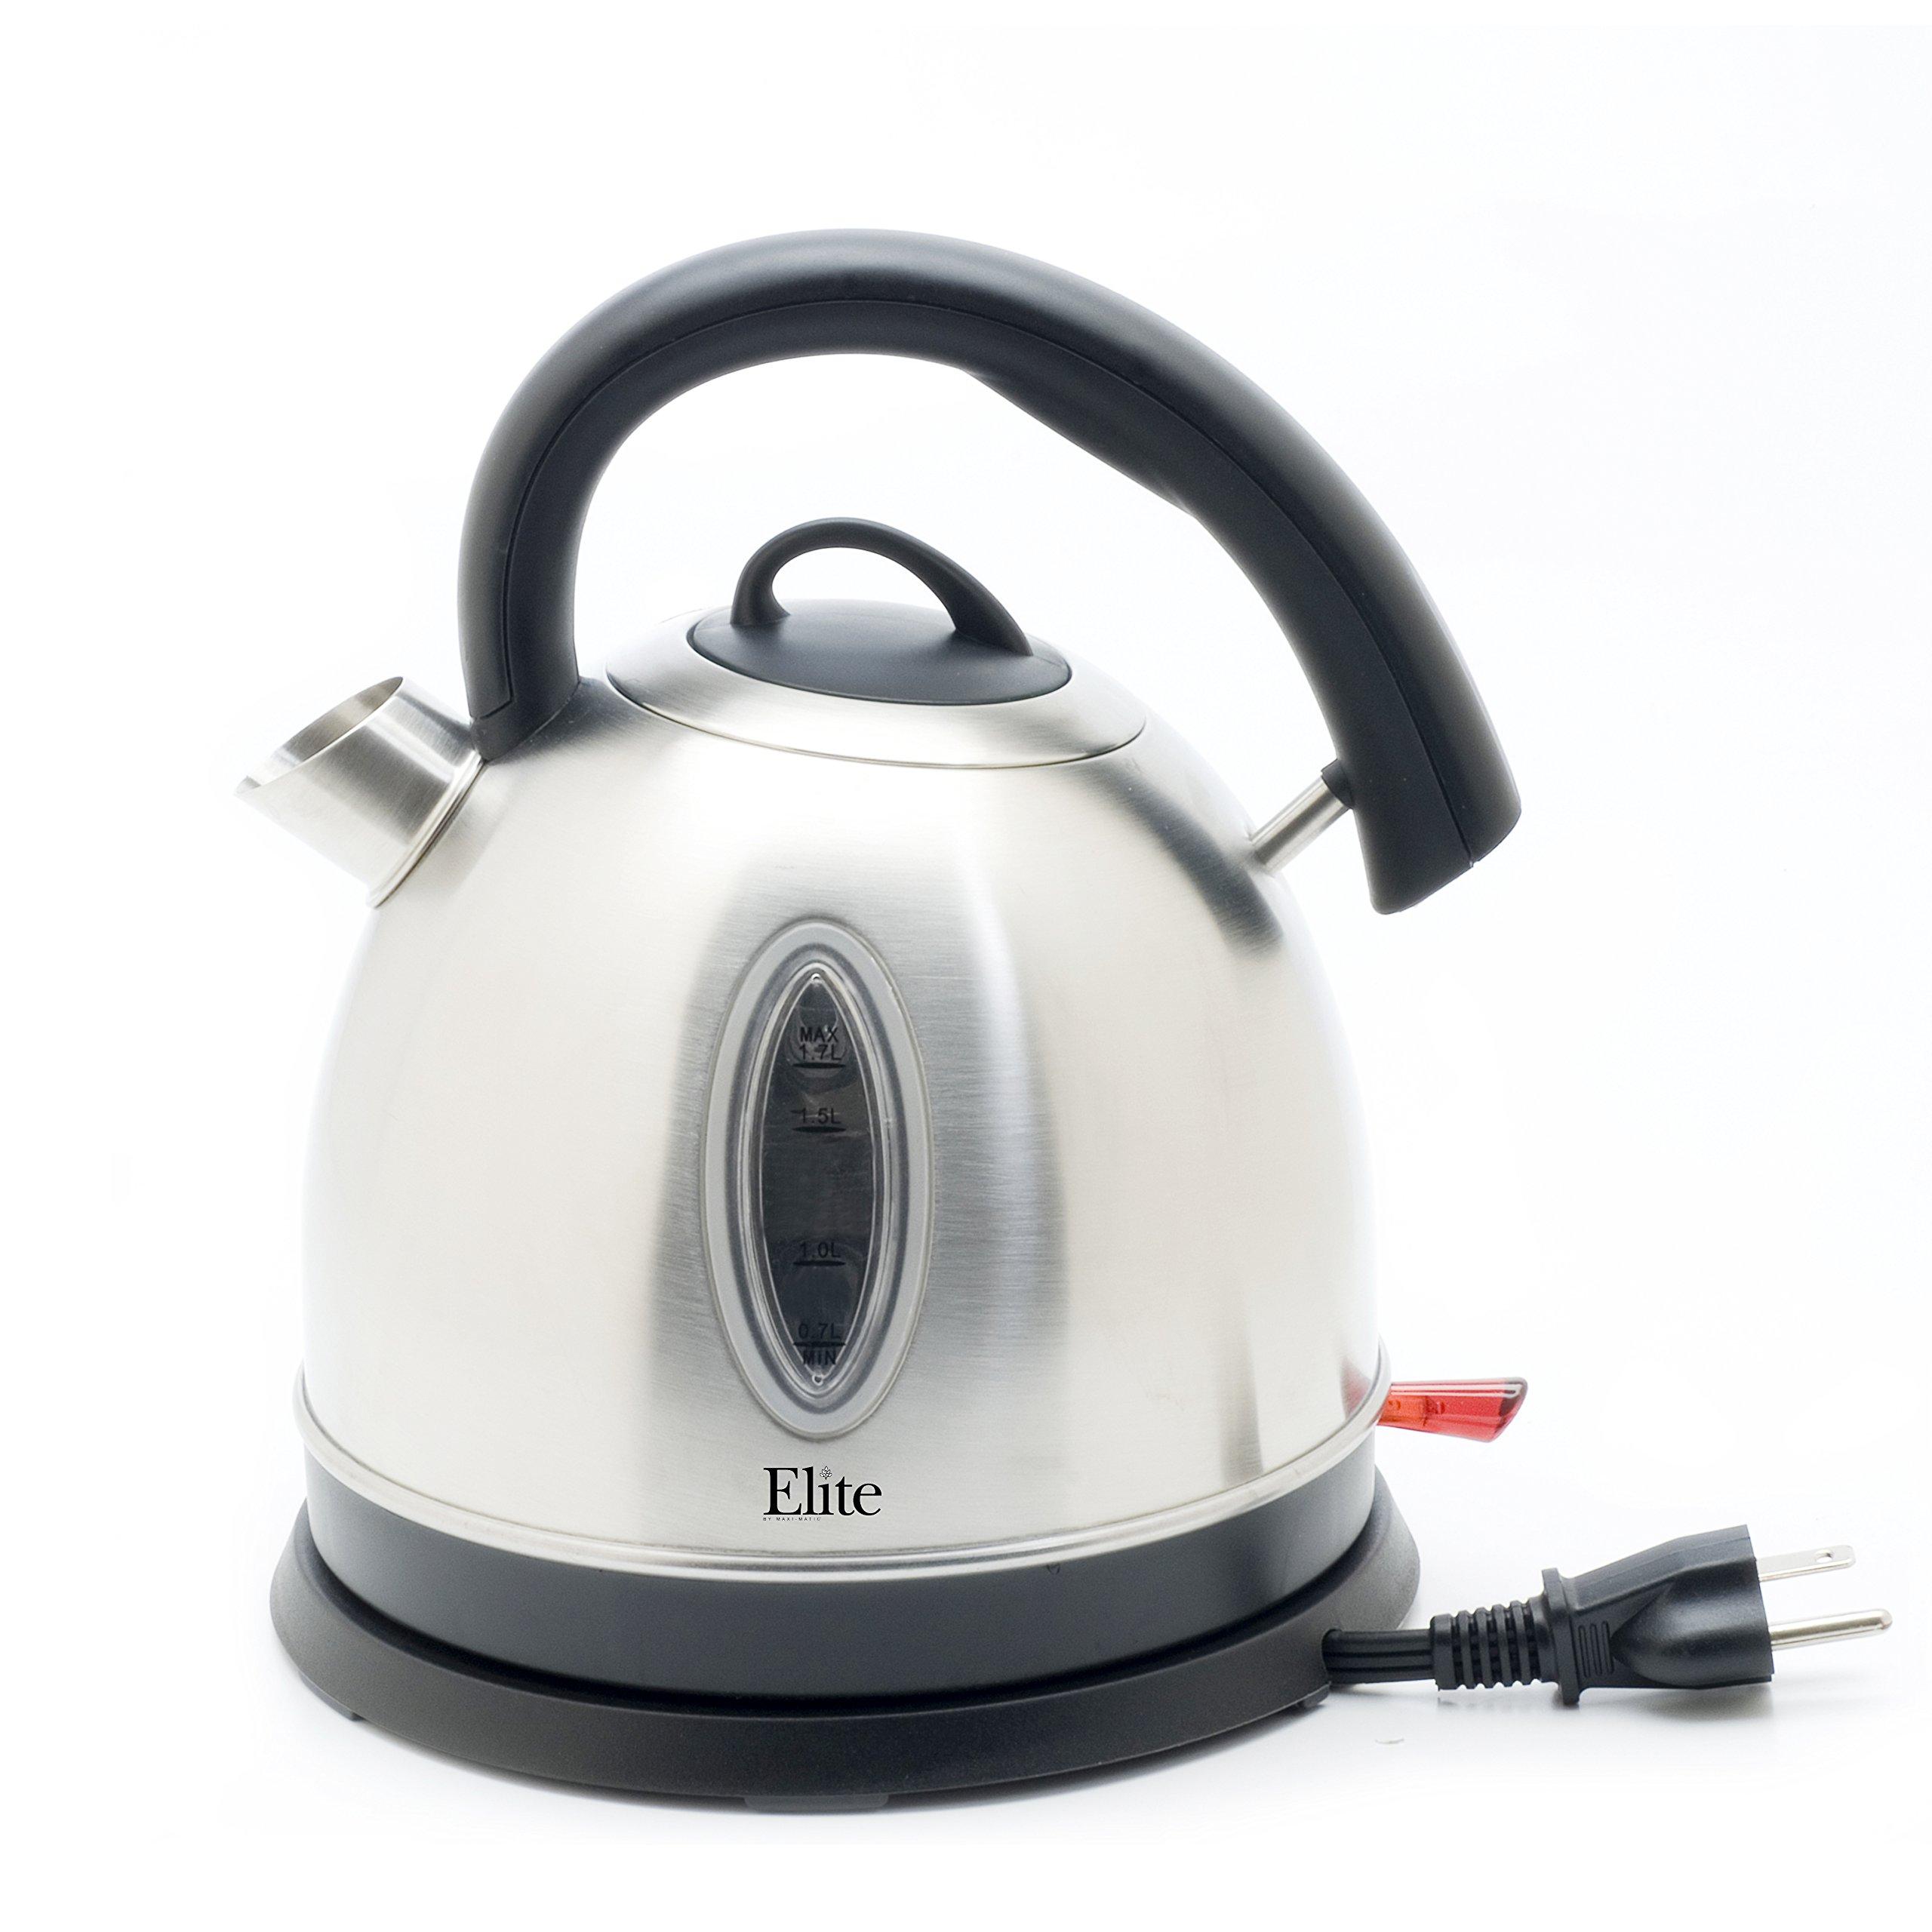 Elite Platinum EKT-6863 Maxi-Matic 1 2/3 Liter Cordless Water Kettle, Stainless Steel